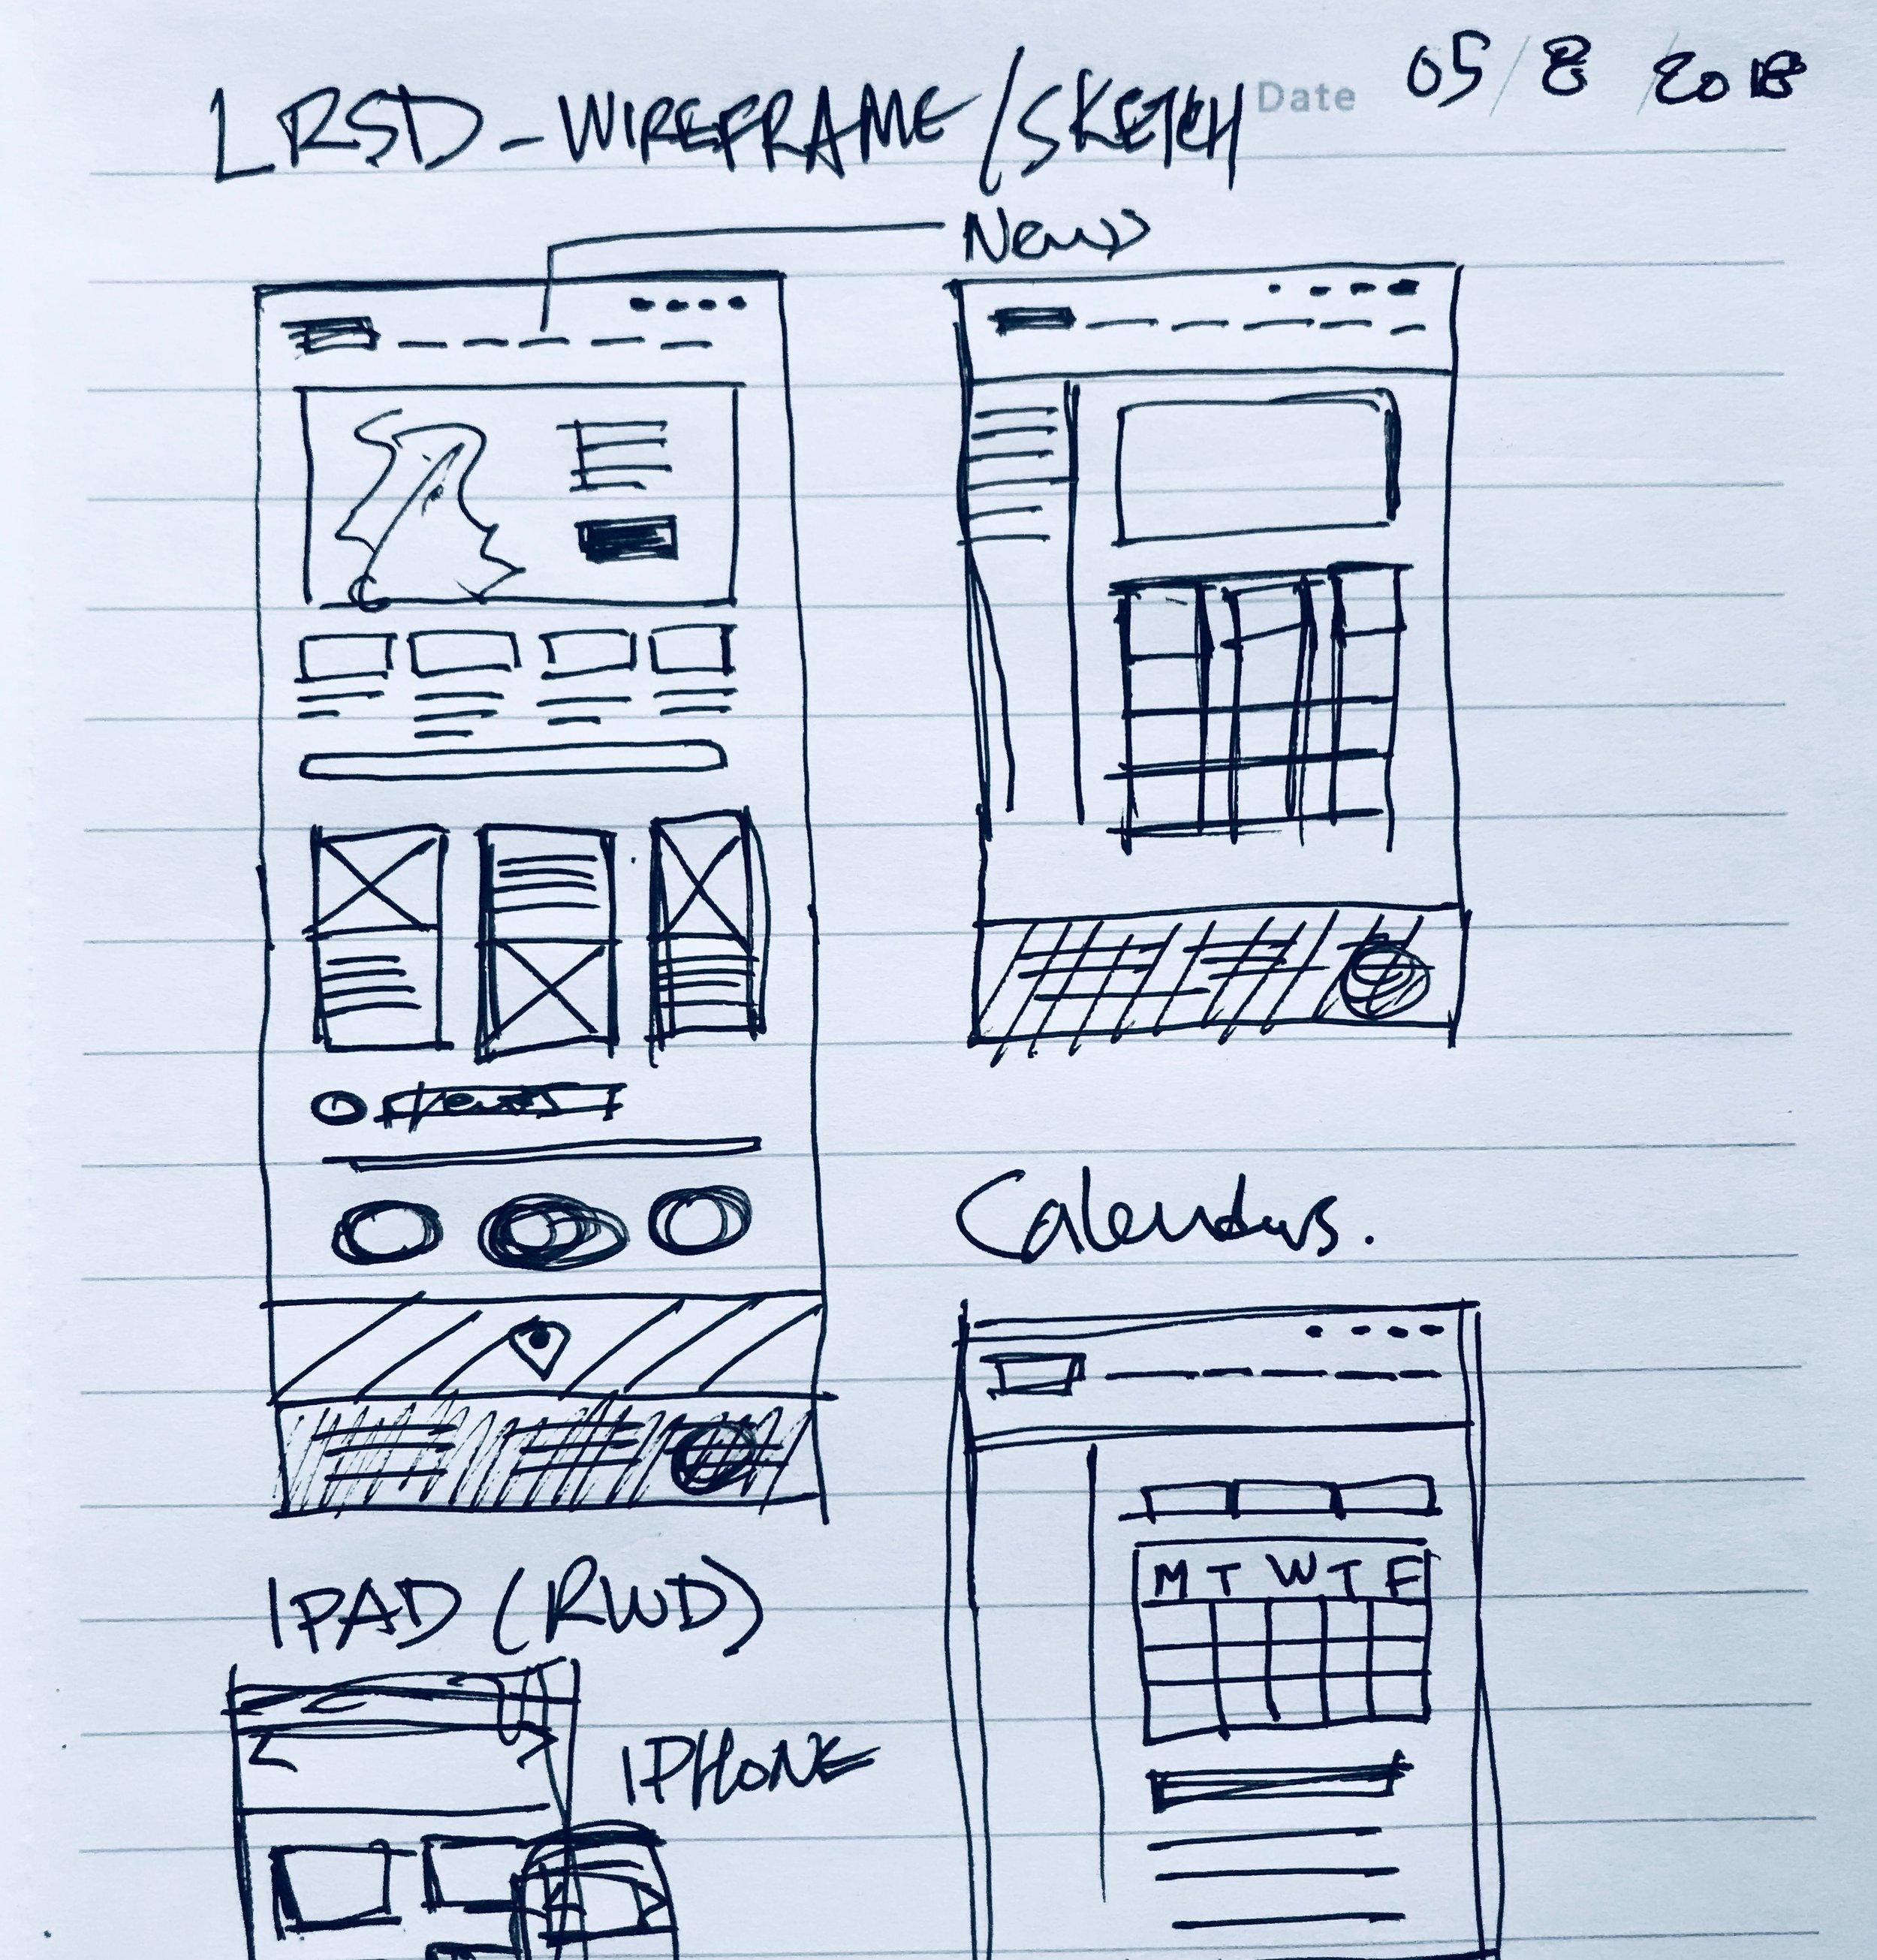 Copy of LRSD Sketch - Initial Comp